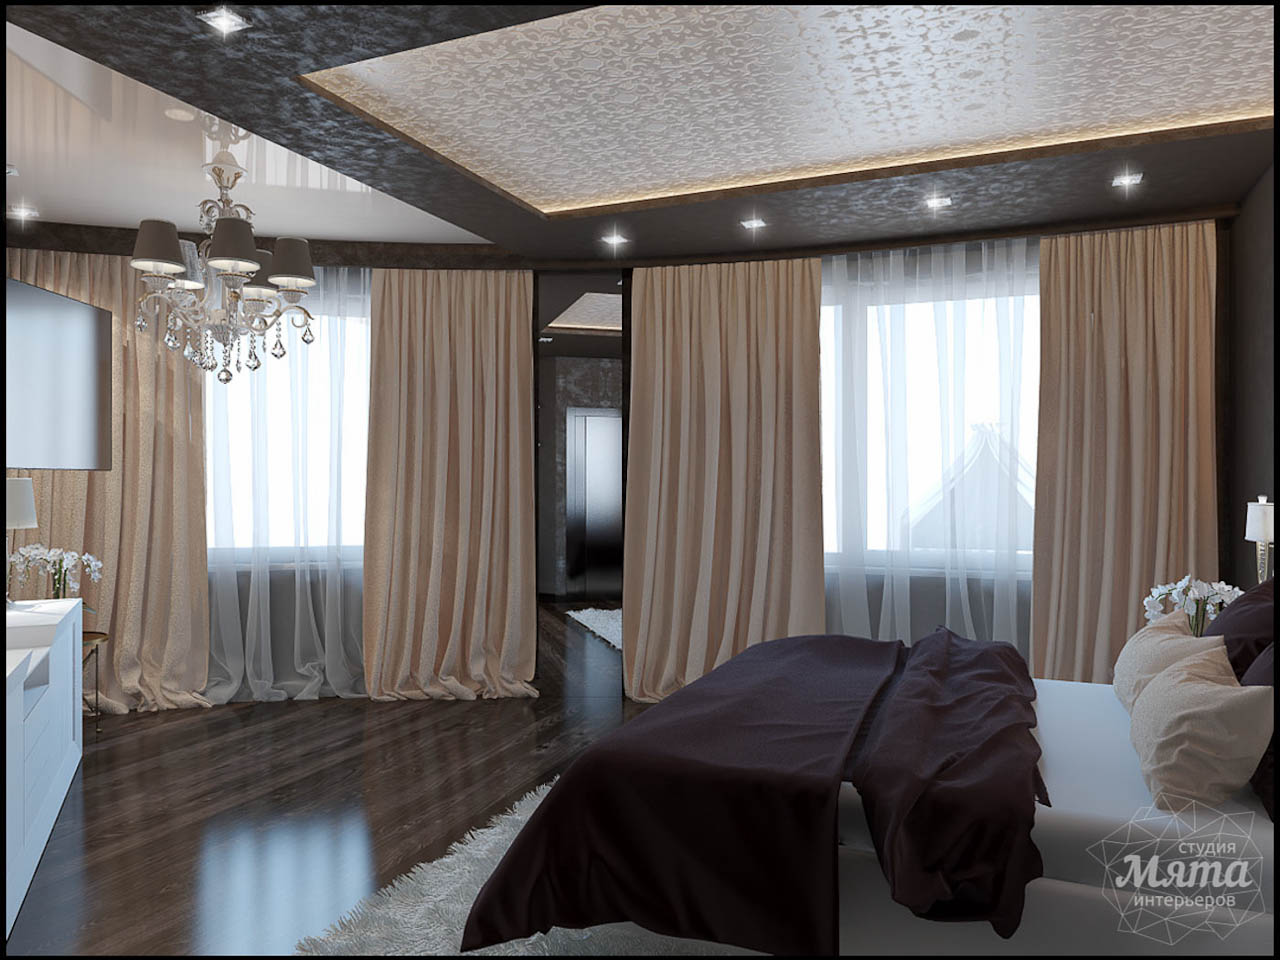 Дизайн интерьера и ремонт трехкомнатной квартиры по ул. 8 Марта 190 img129337011